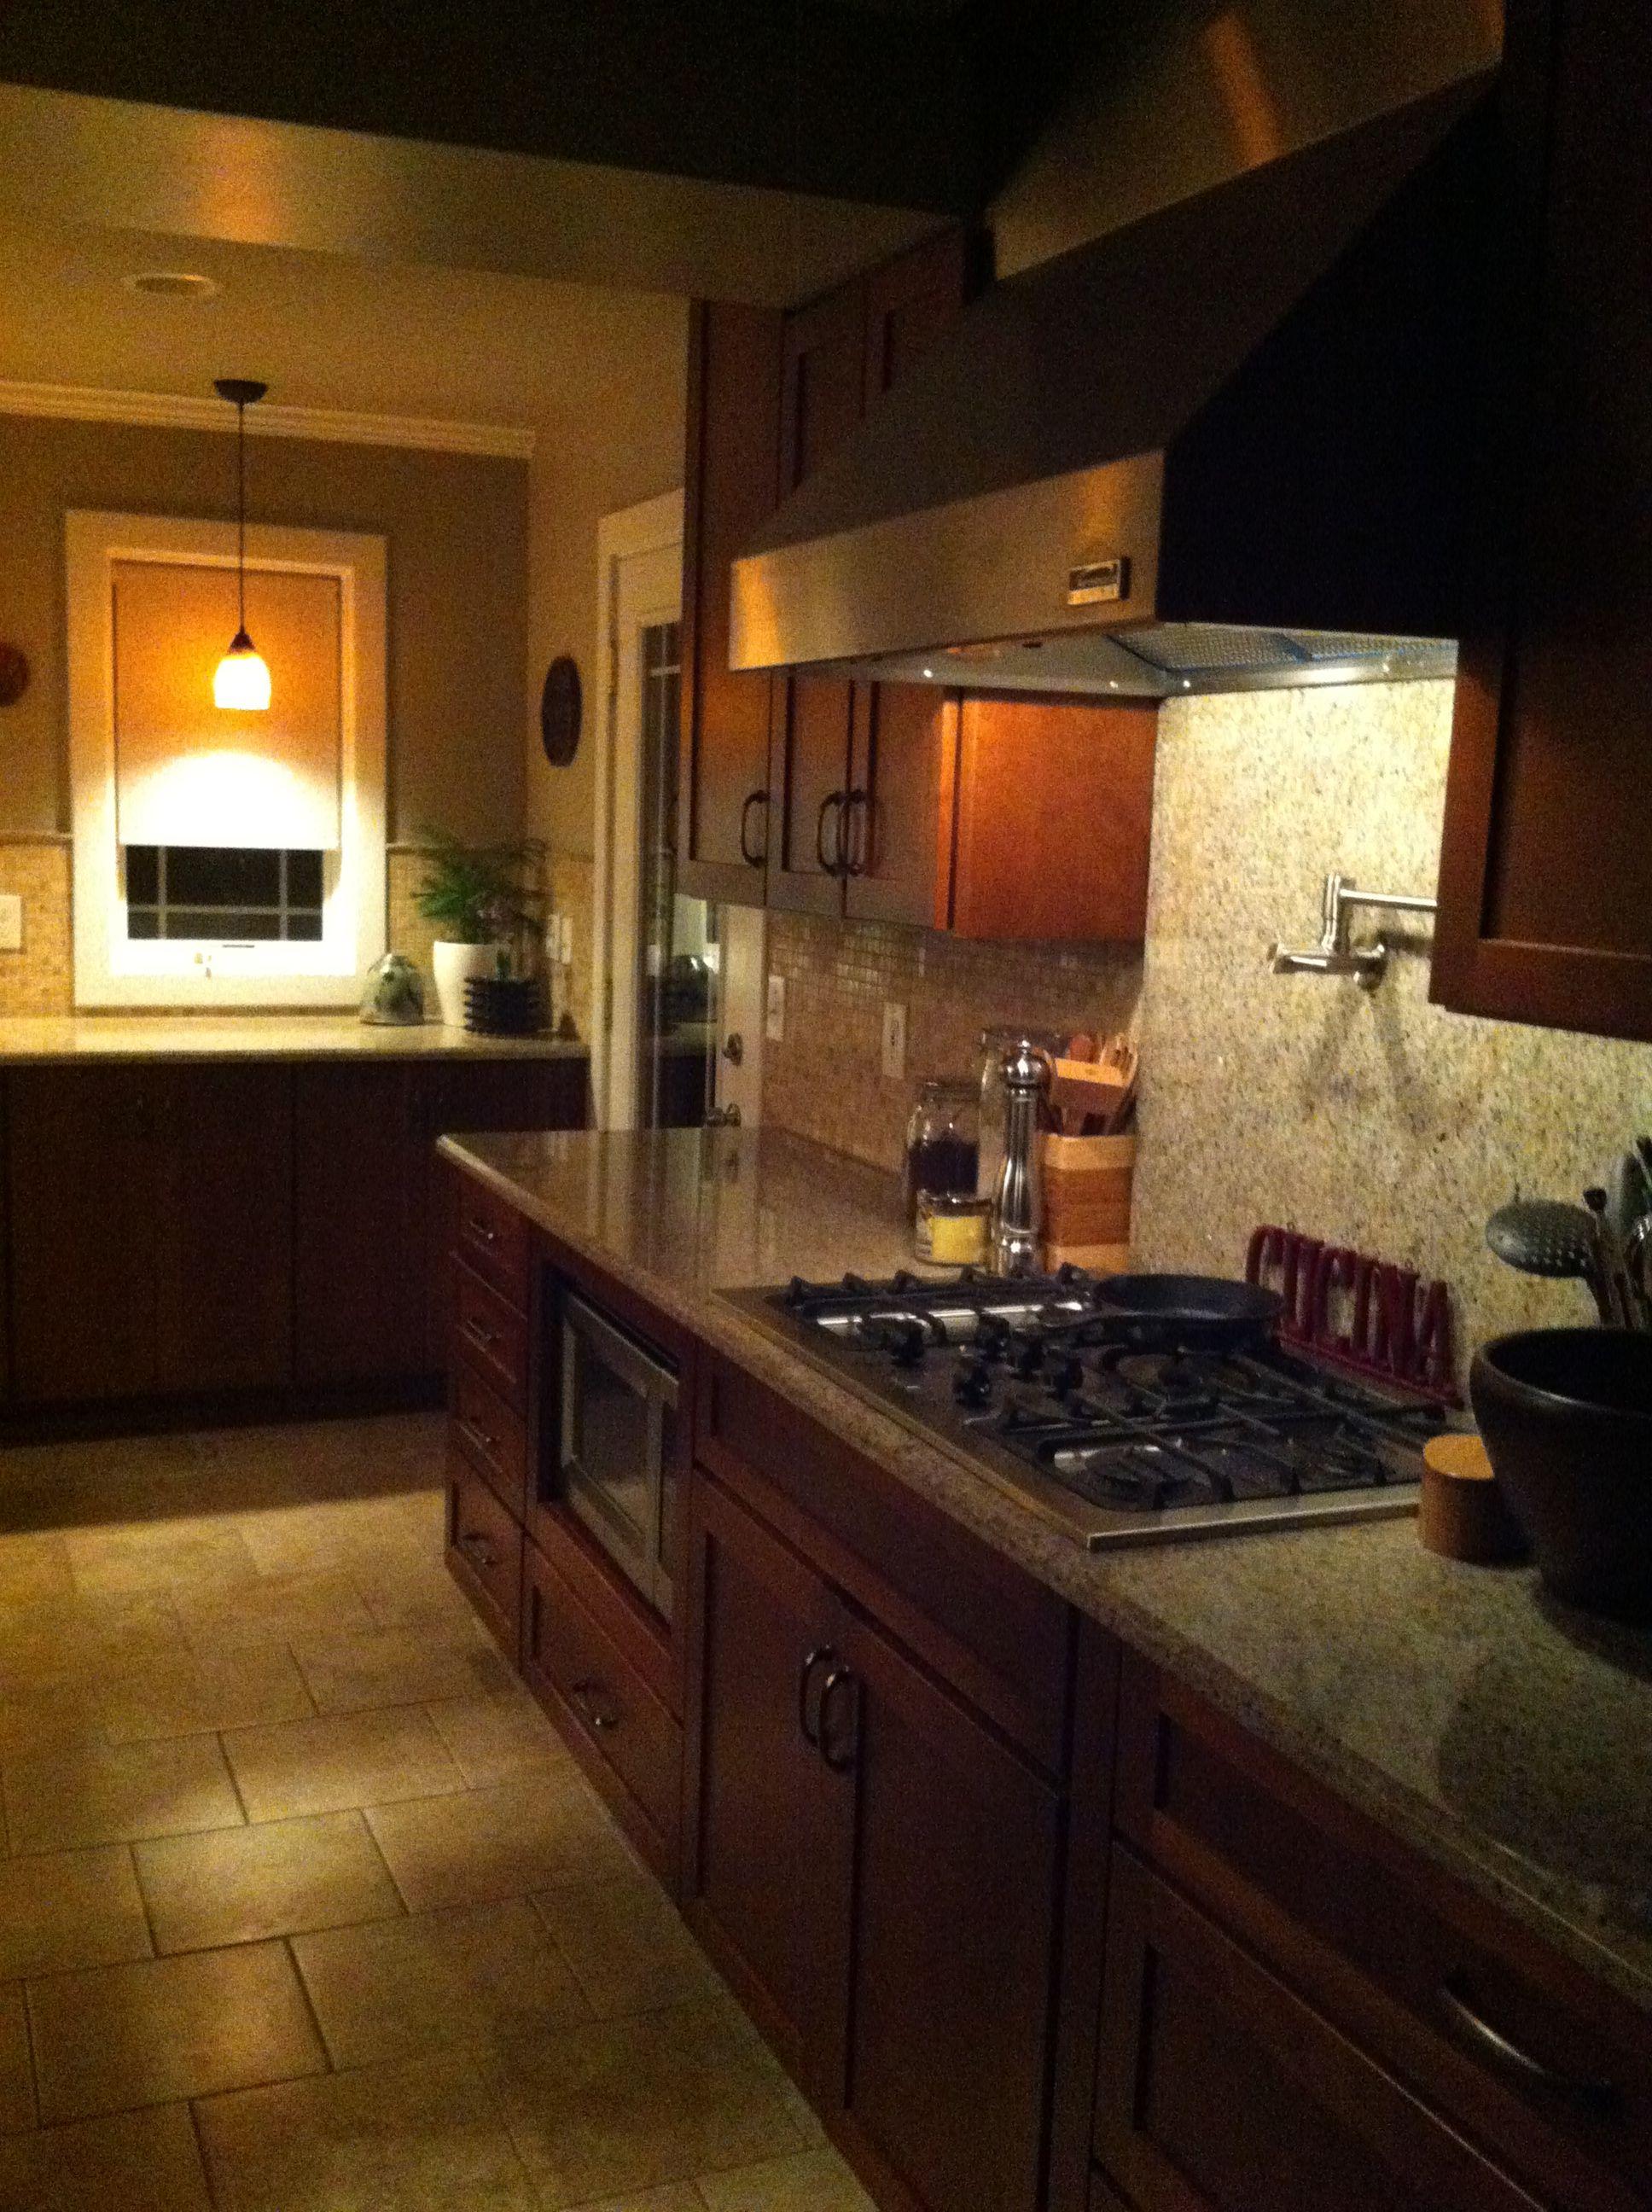 Kitchen Sherwin Williams Mindful Grey Walls Granite